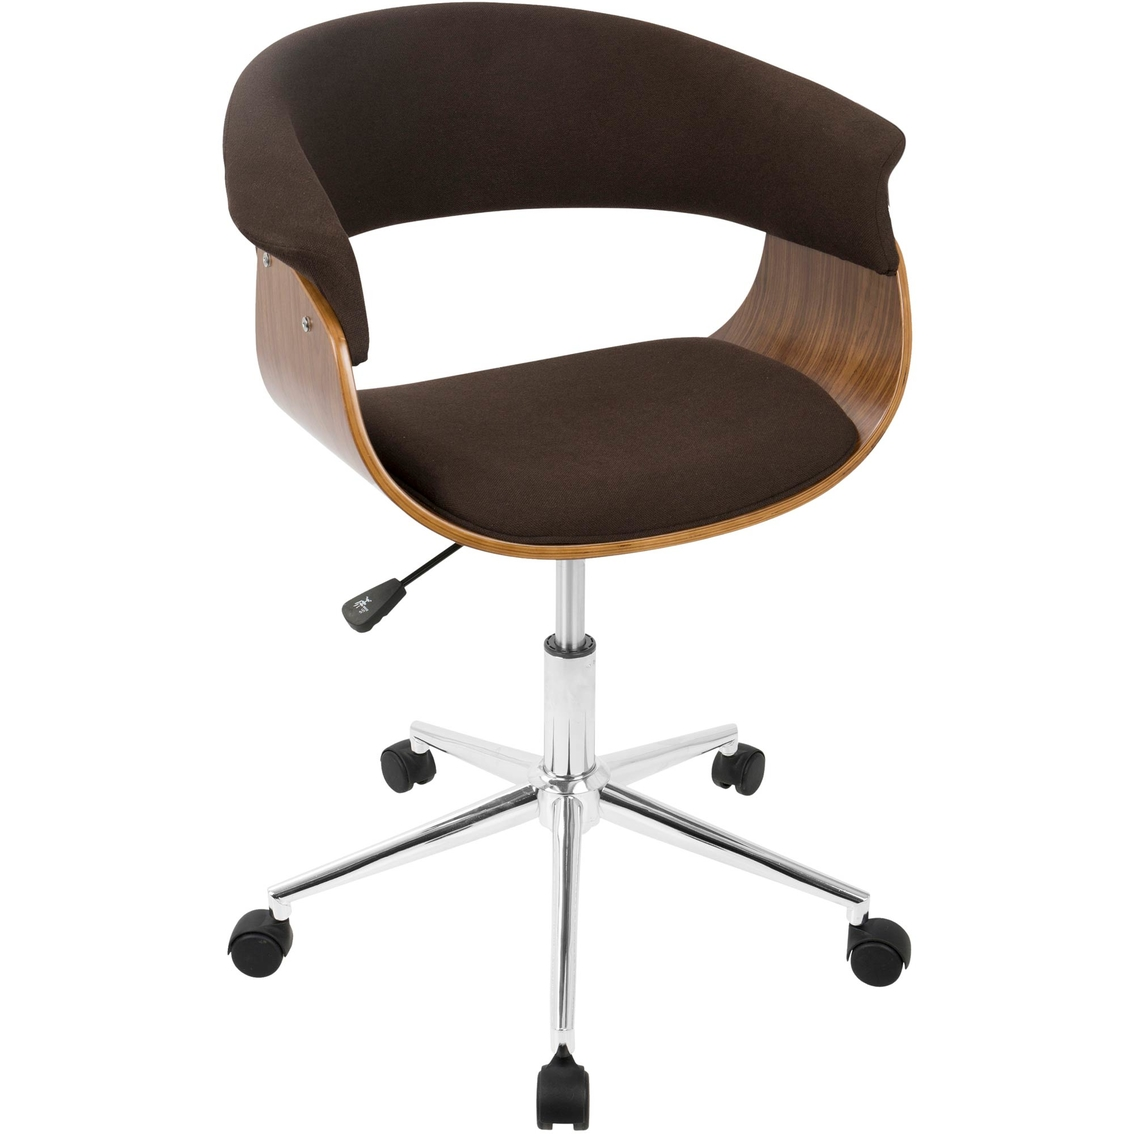 Lumisource Vintage Mod Chair Office